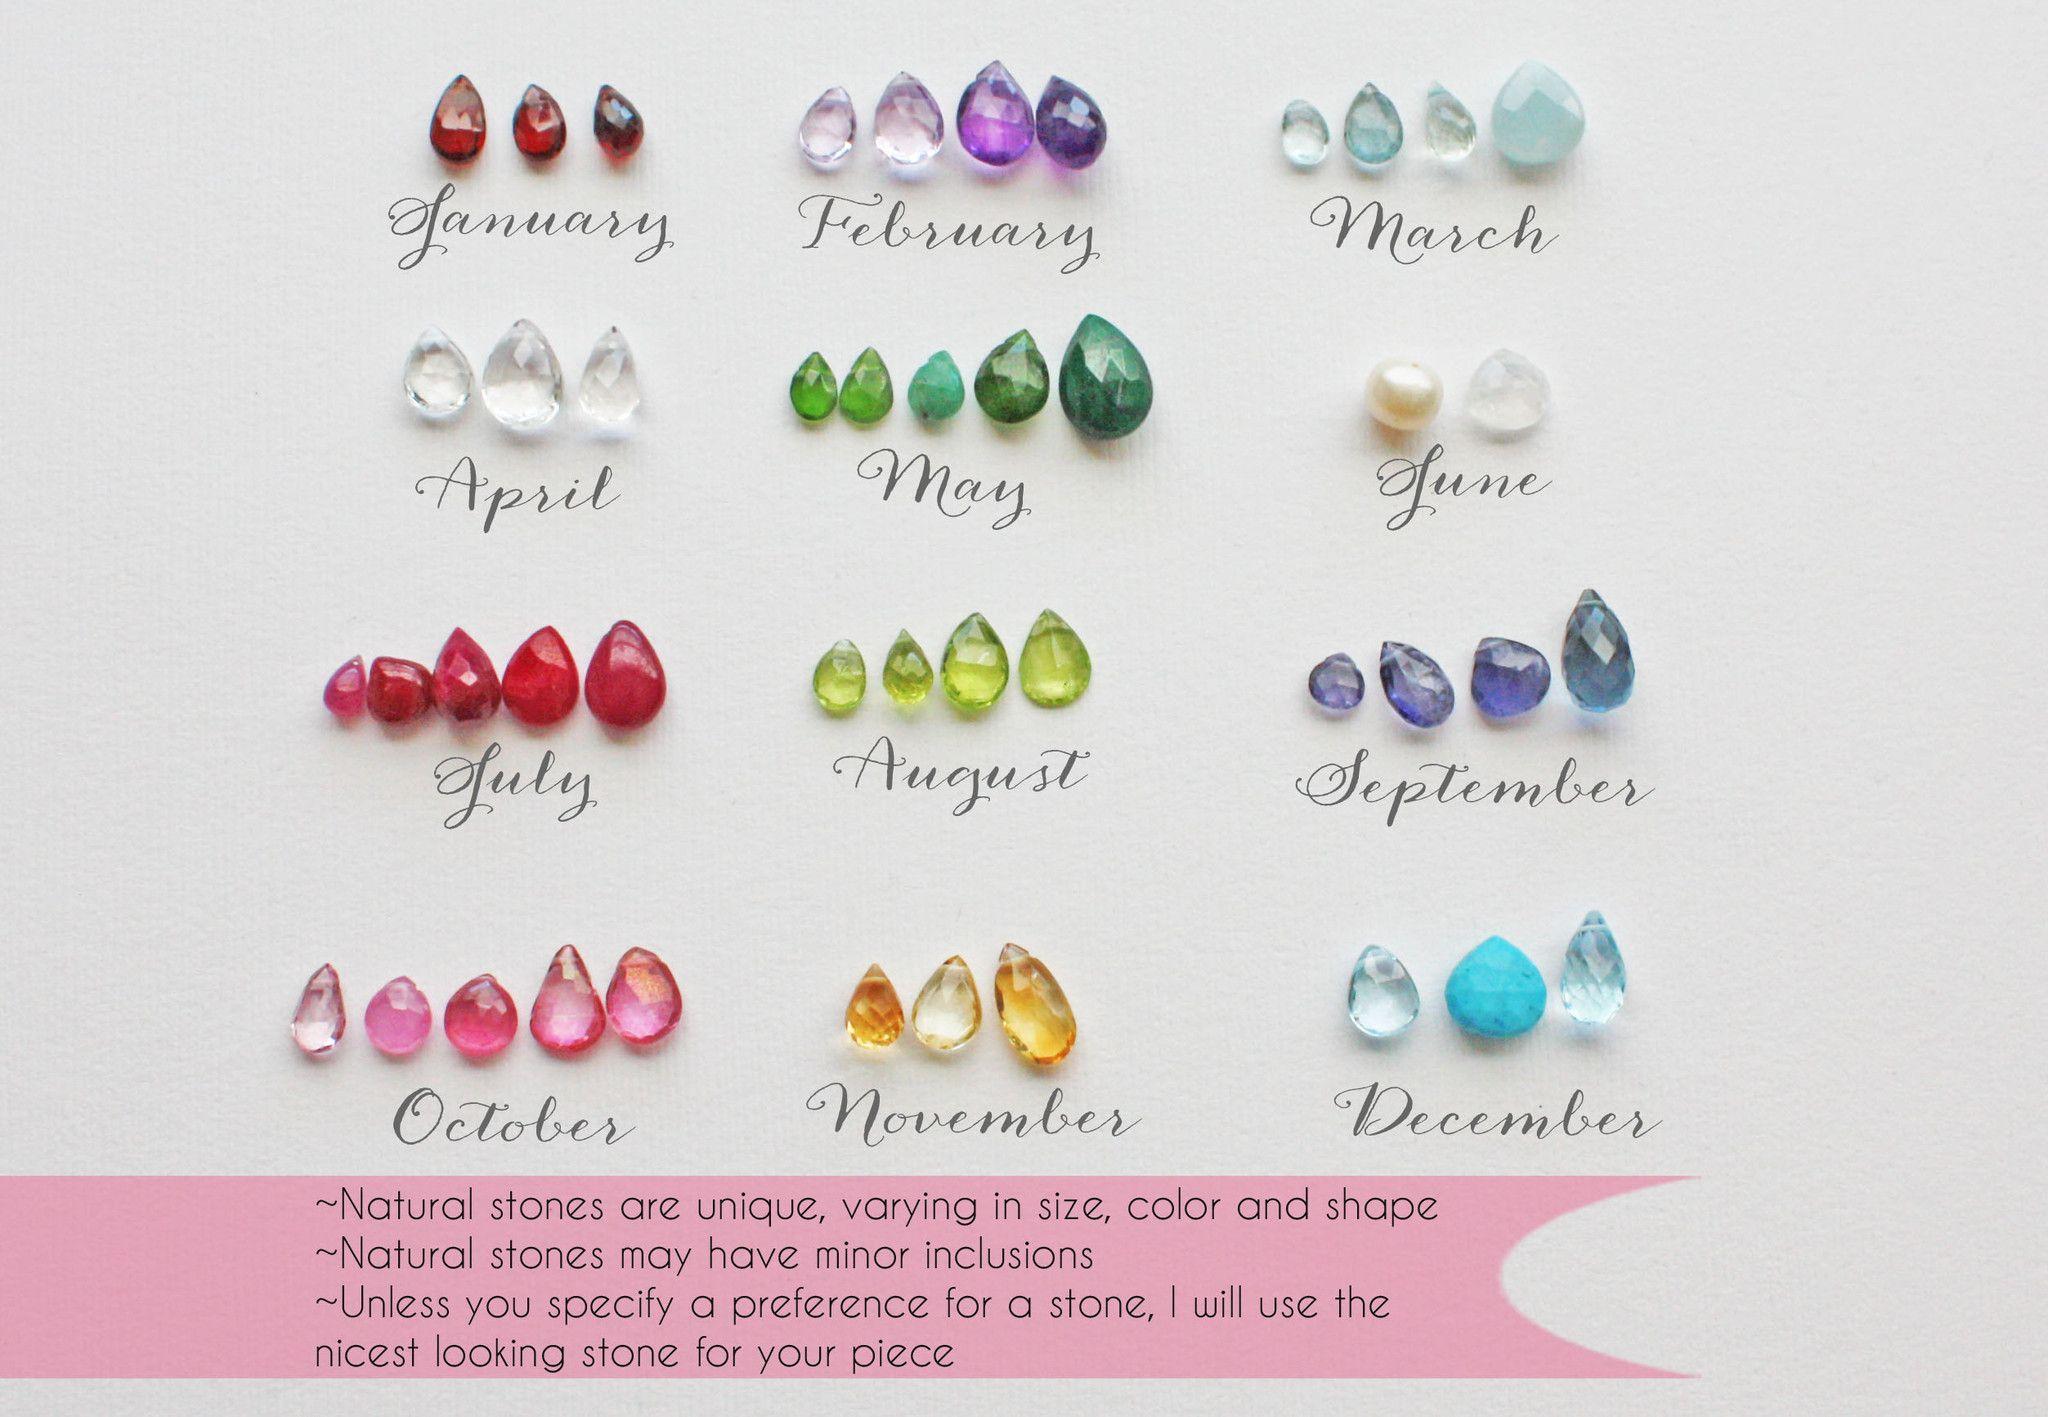 Cute All Stone Names Photos - Jewelry Collection Ideas - morarti.com